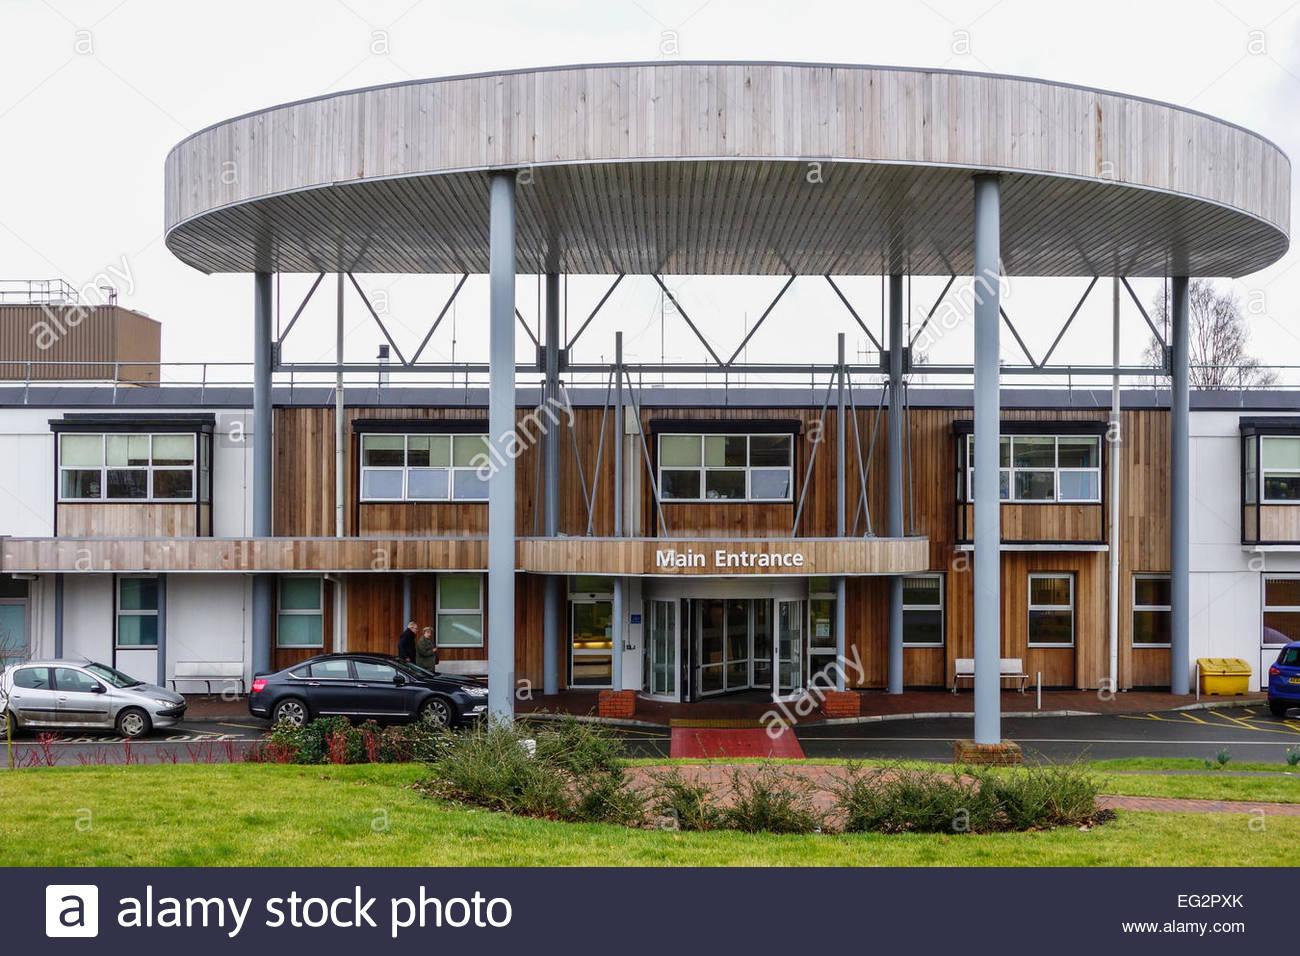 Hinchingbrooke Hospital, part of the Hinchingbrooke Hospital Trust, run by private company Circle - Stock Image